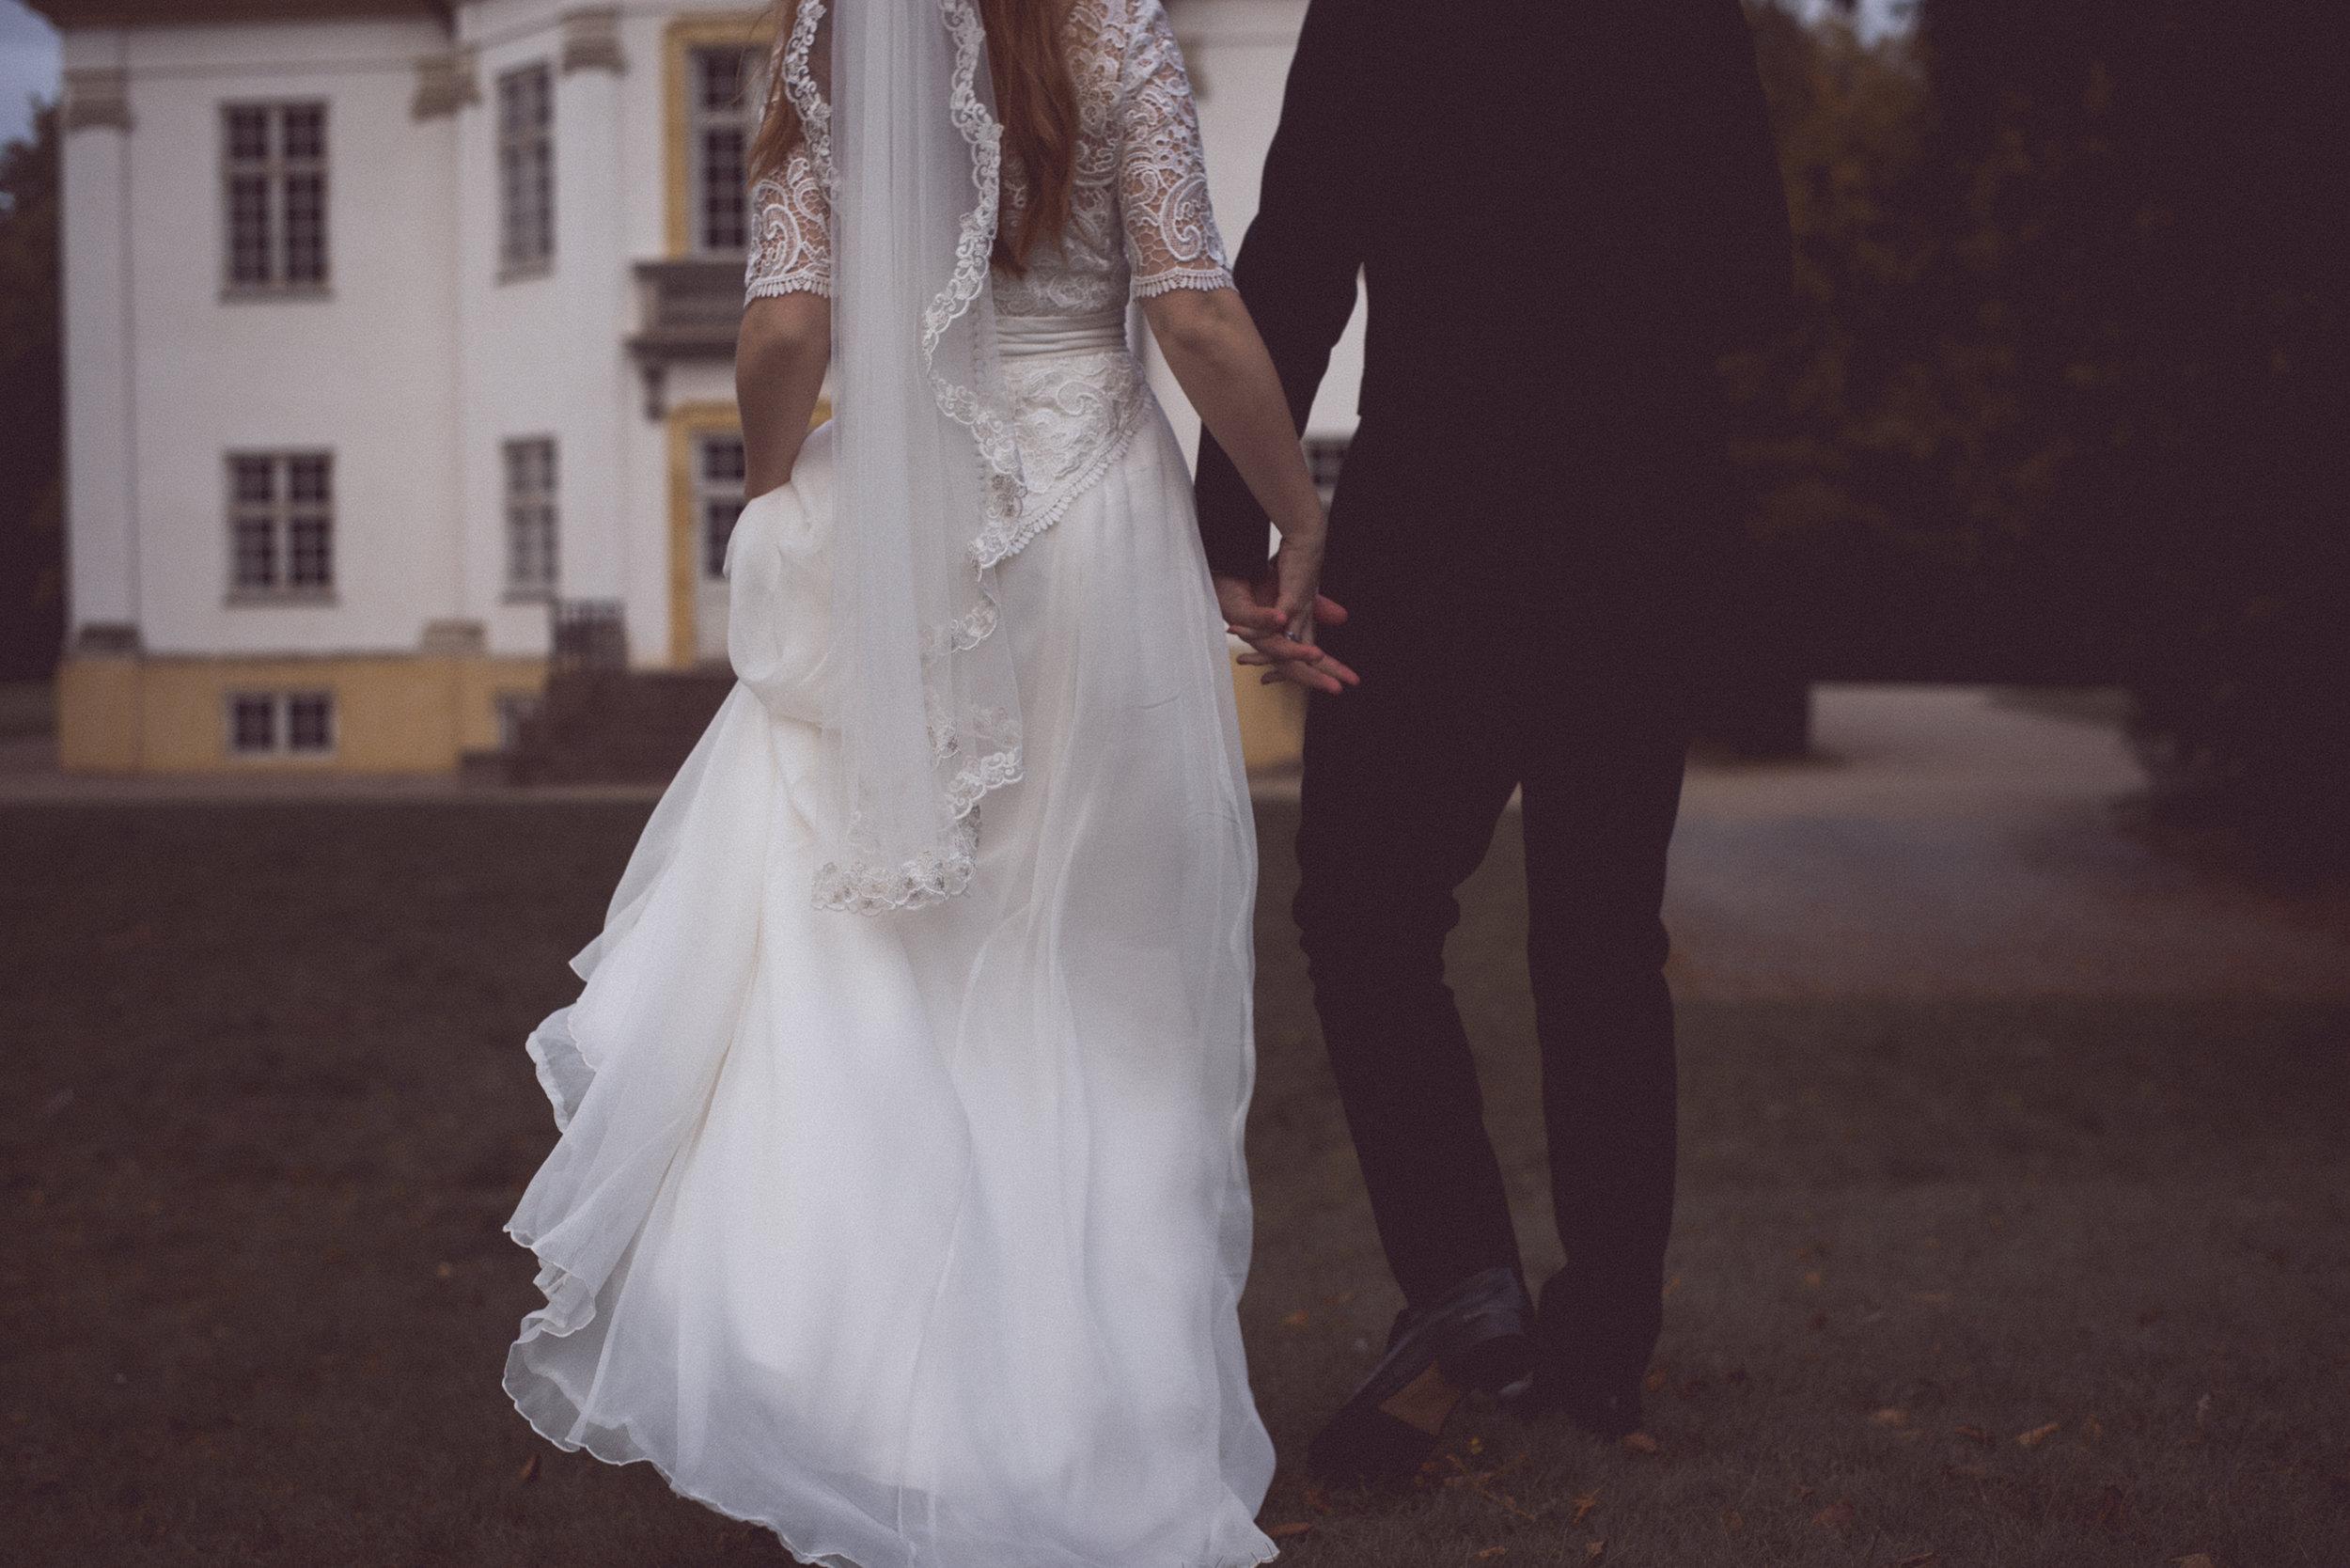 York Region Ontario Wedding Photographer - Bride + Groom-2-3.jpg